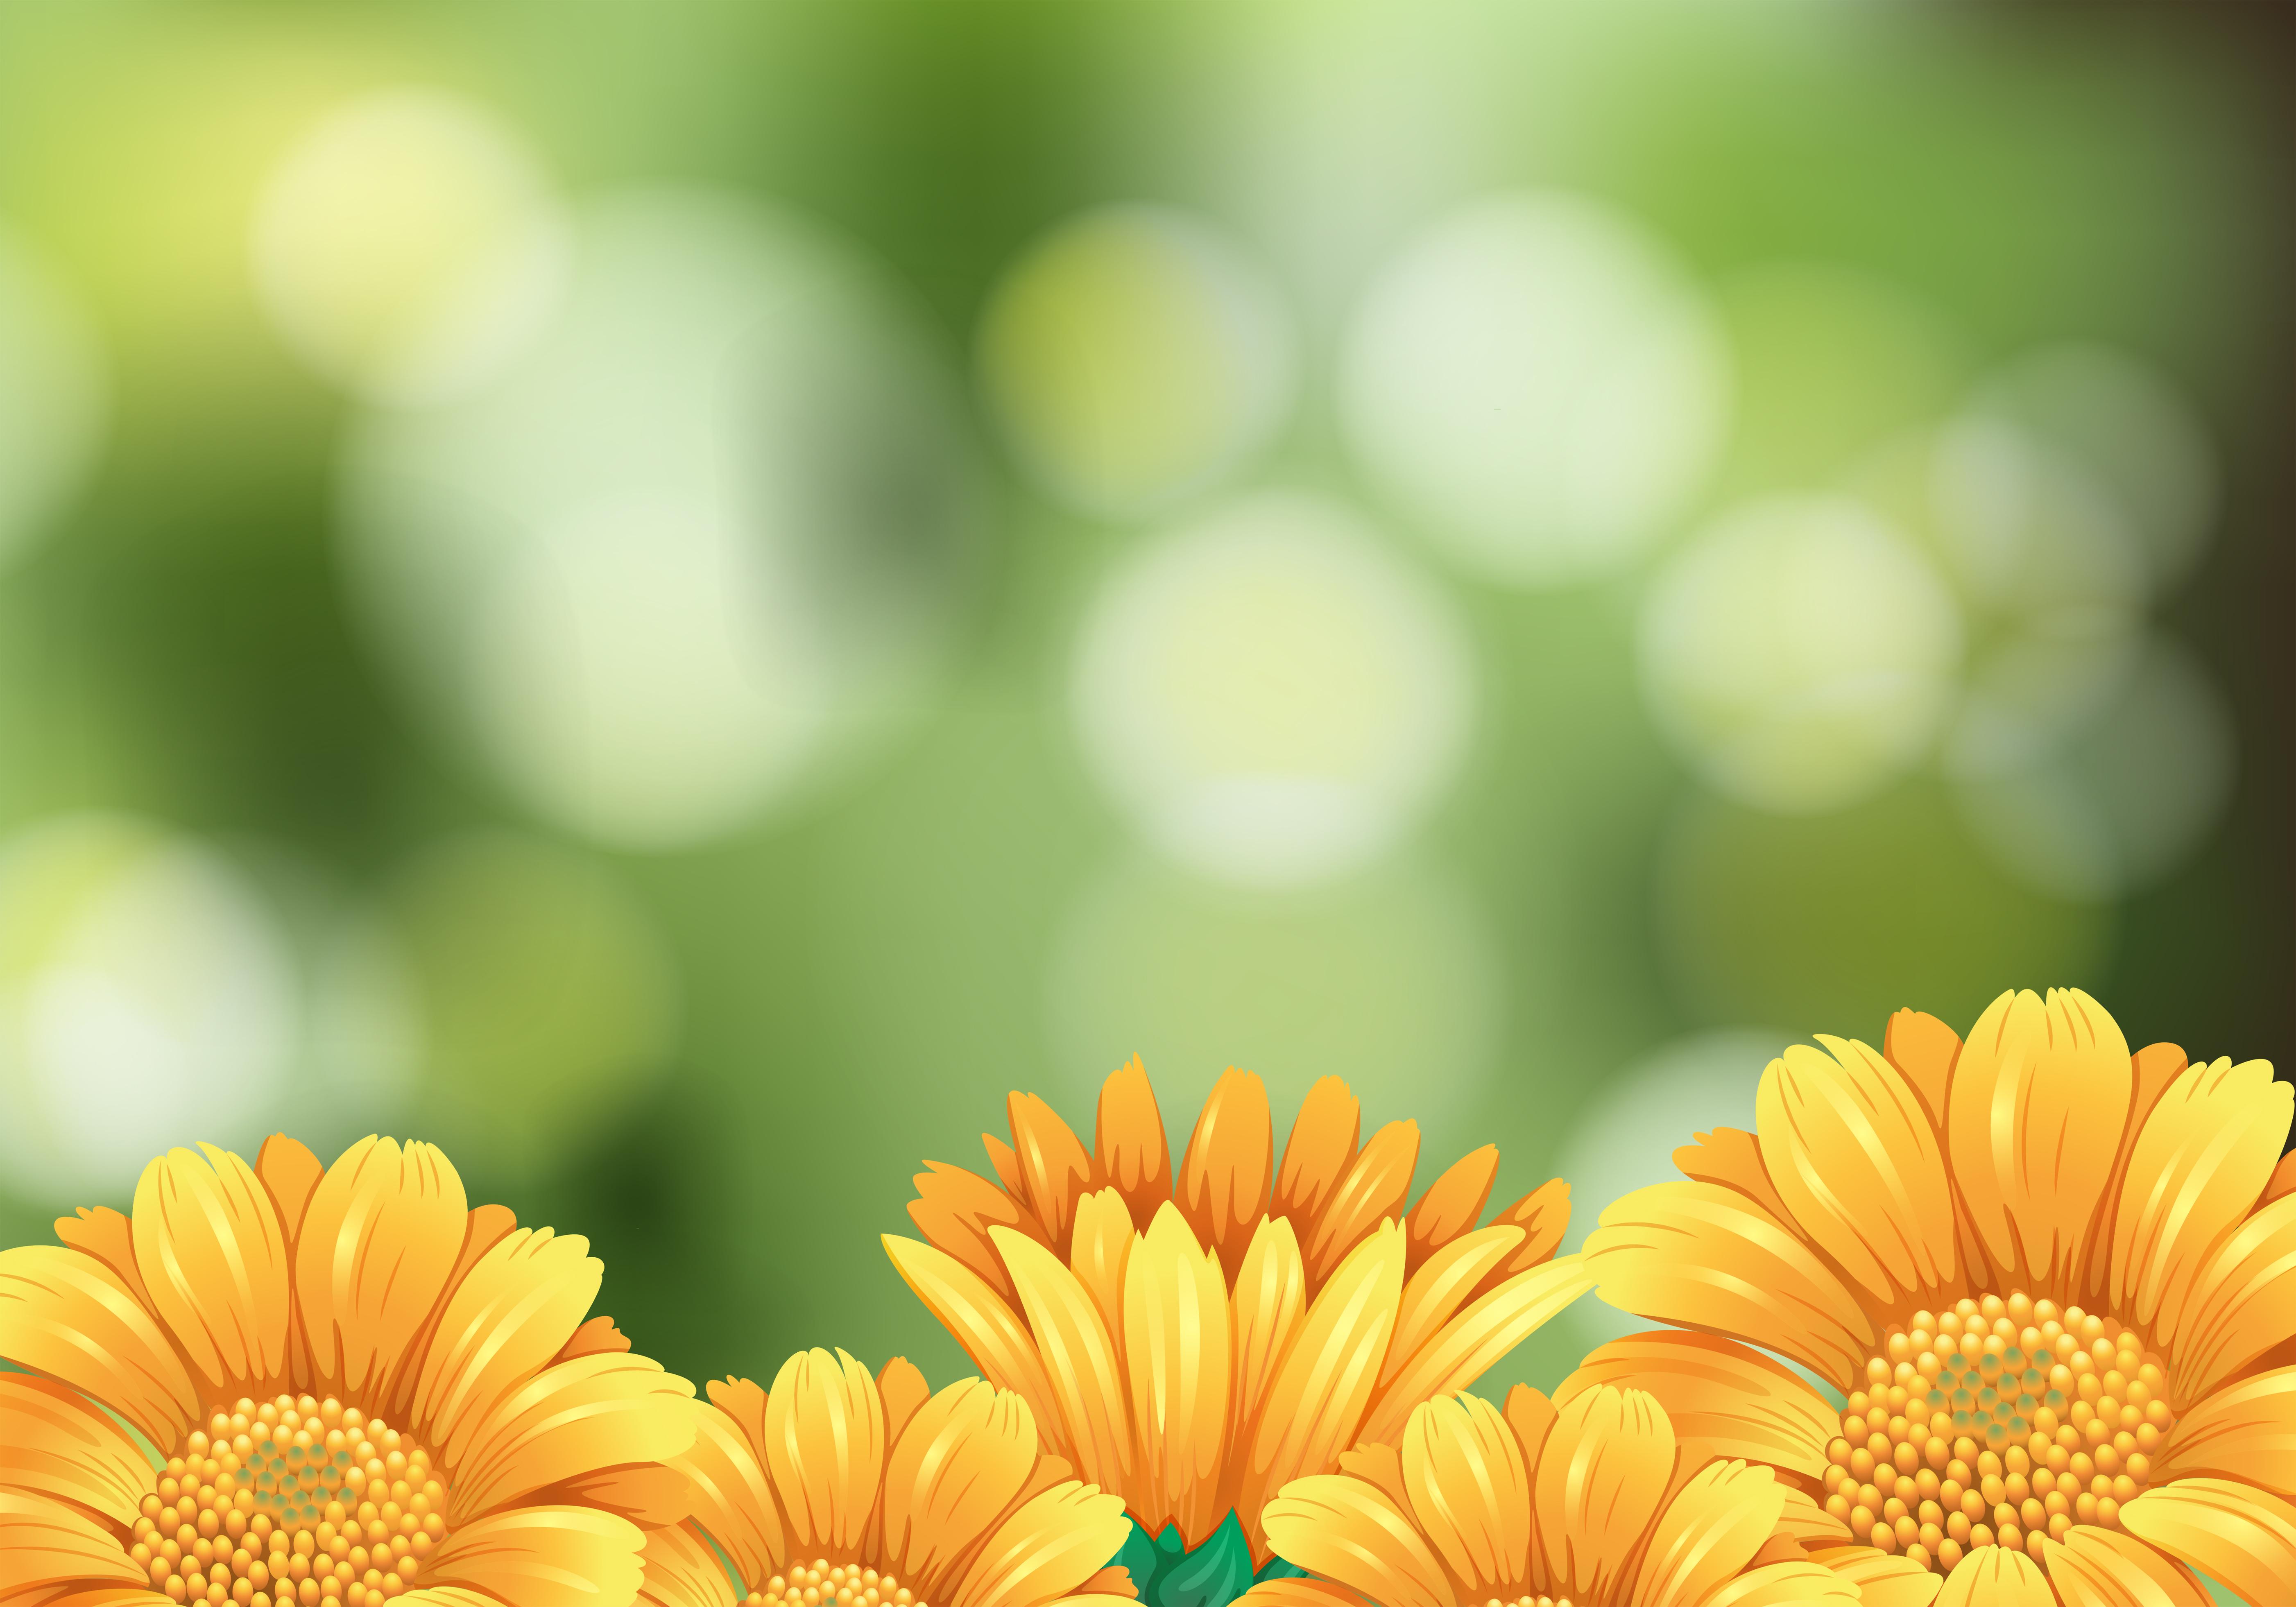 Sun Flower Illustration